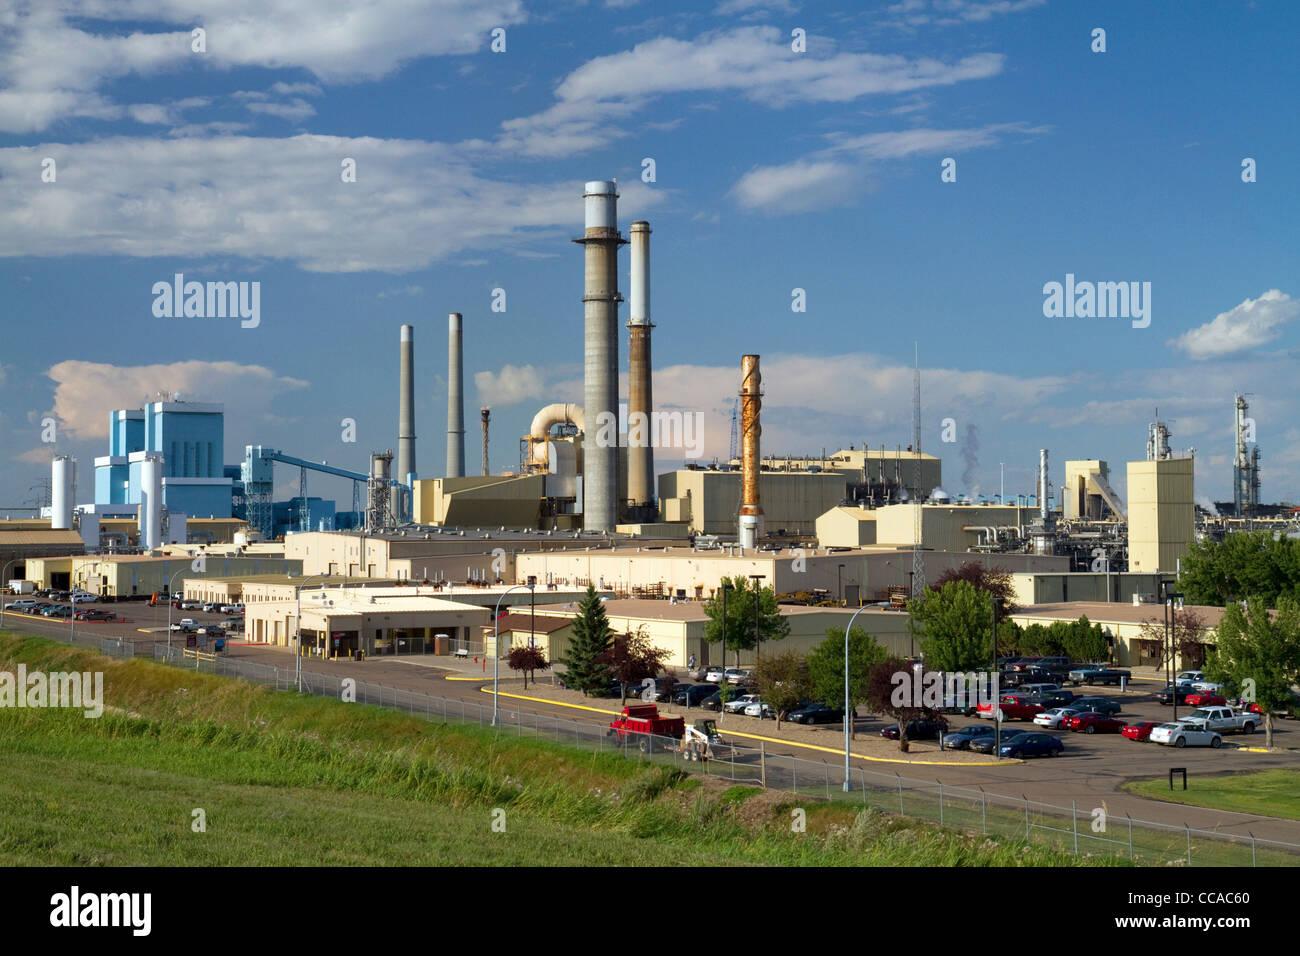 Great Plains Synfuels coal gasification plant near Beulah, North Dakota, USA. Stock Photo